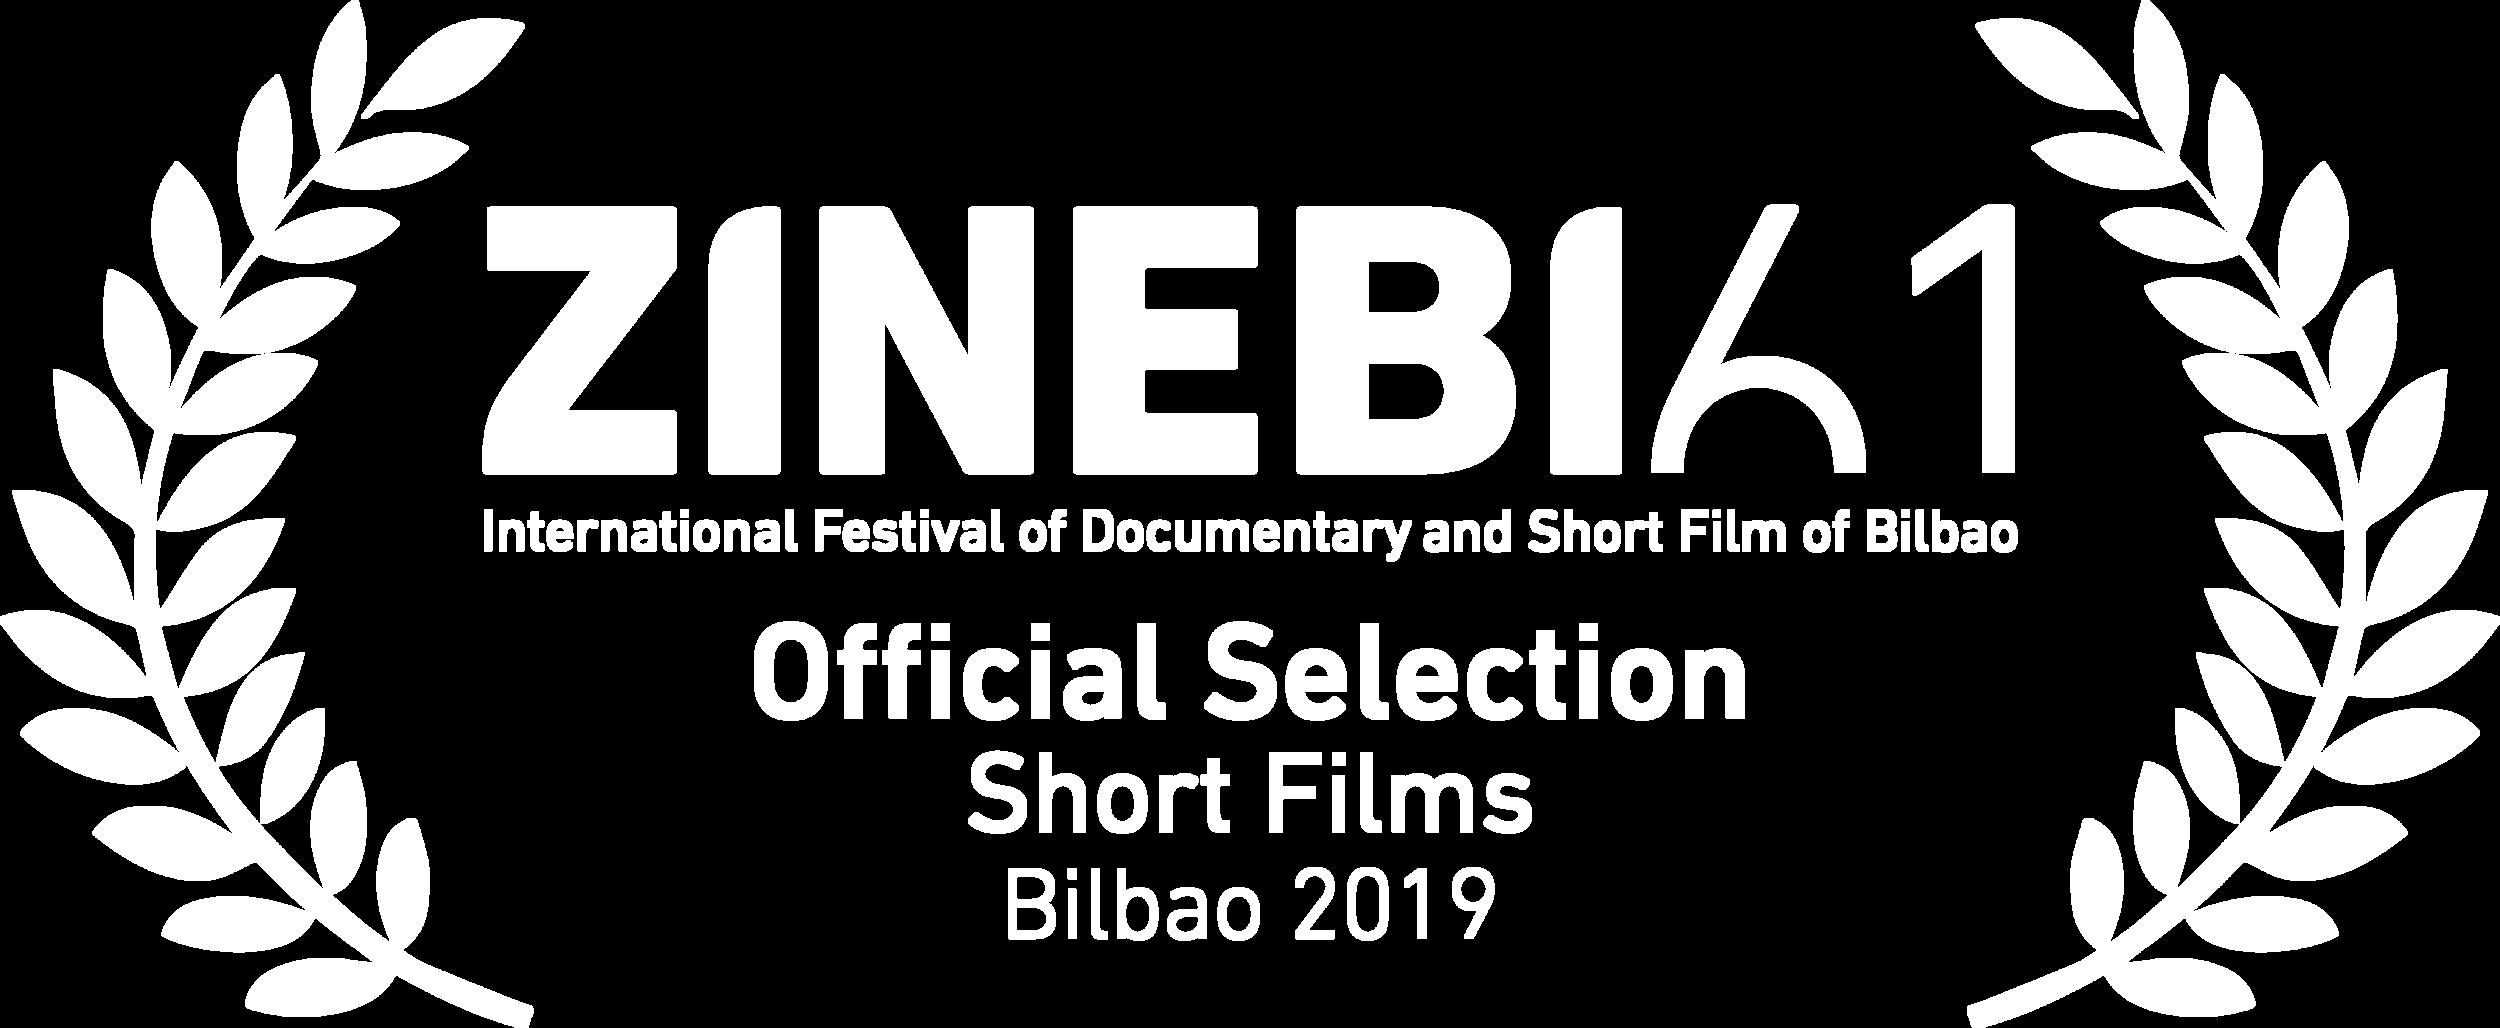 SHORT FILMS Official Selection_zinebi61 copy.png